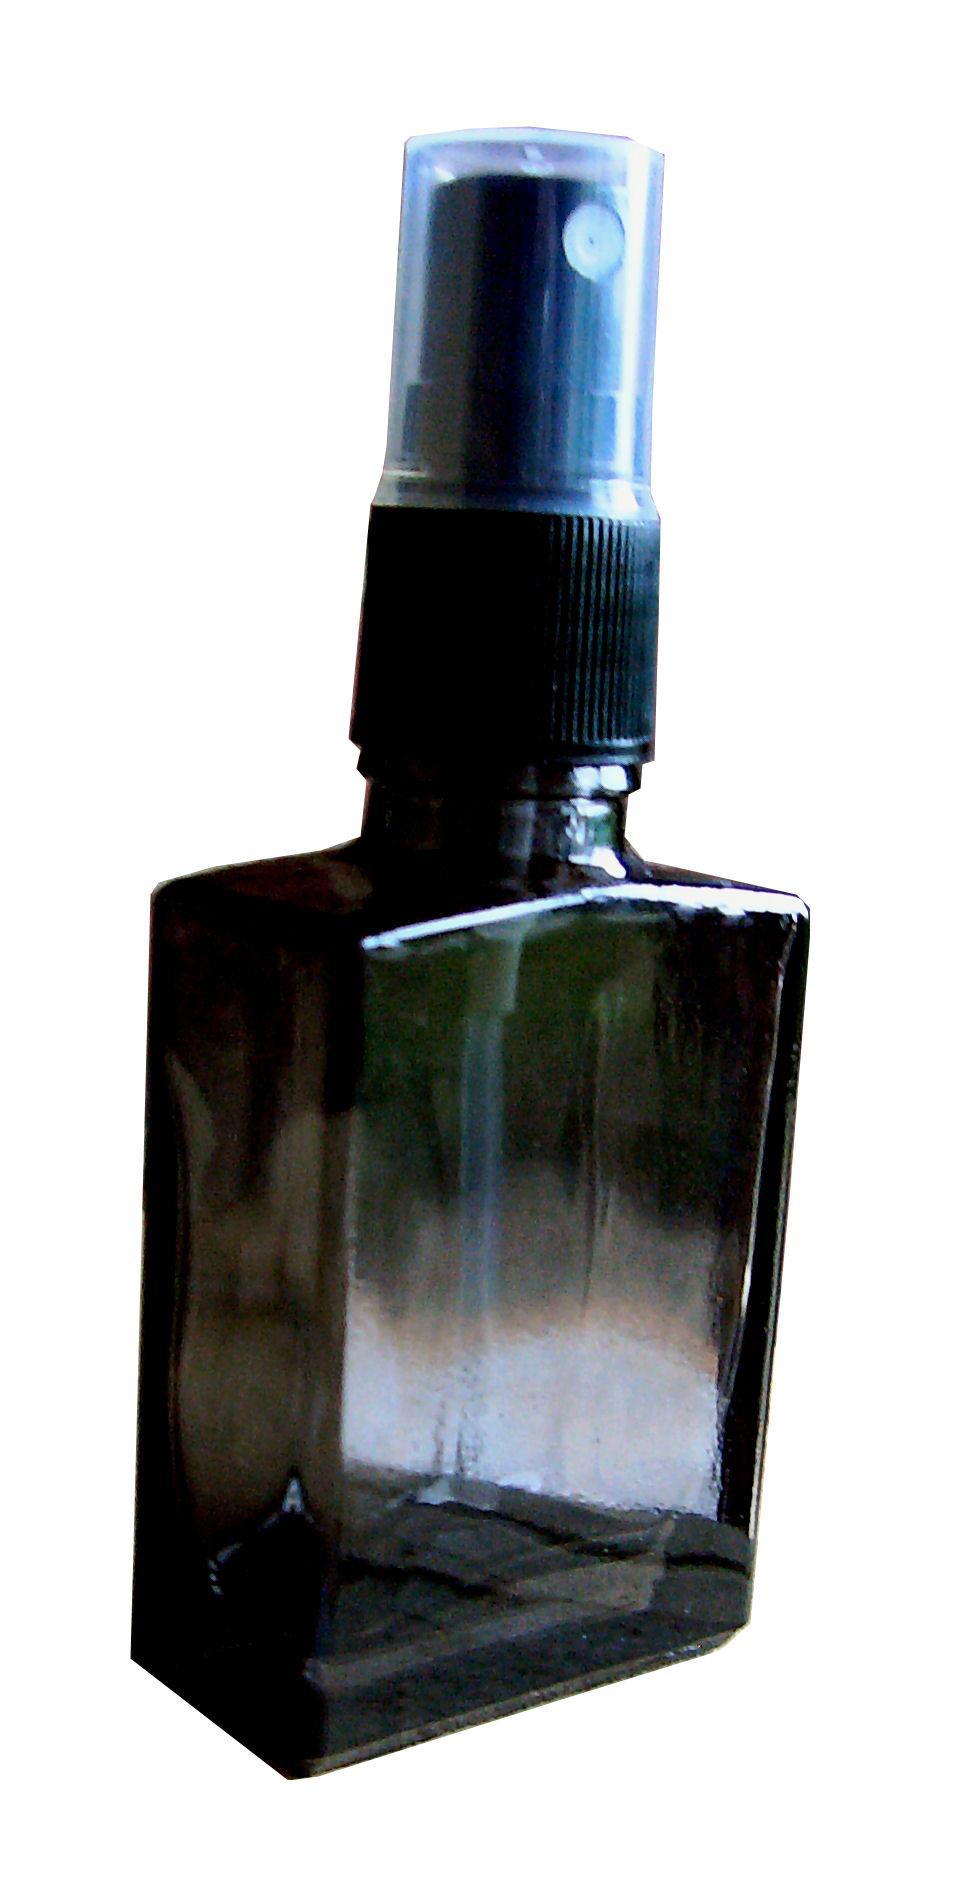 Parfumflakon aus Glas rechteckig mit Zerstäuber 30ml leer schwar